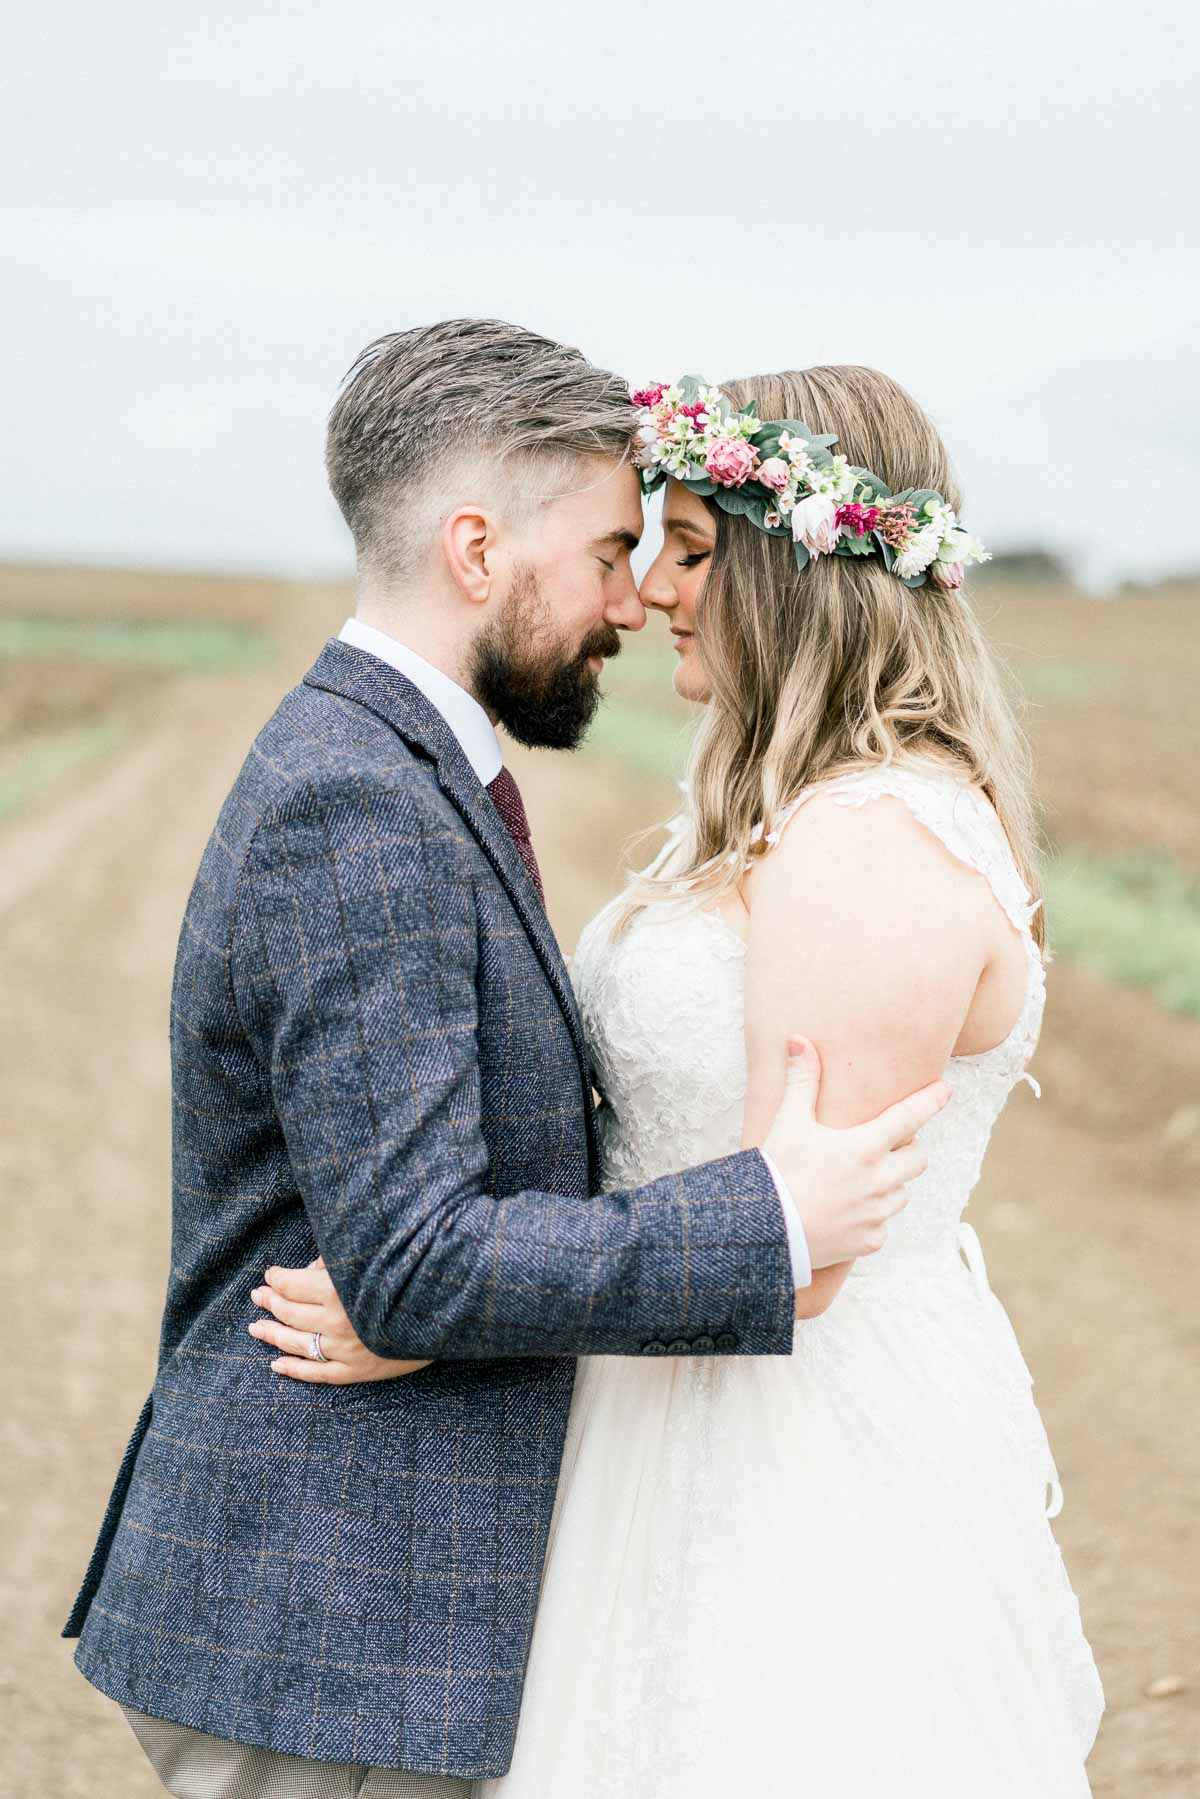 adams-farm-coldstream-yarra-valley-wedding-heart+soul-weddings-kel-jarryd-05561.jpg